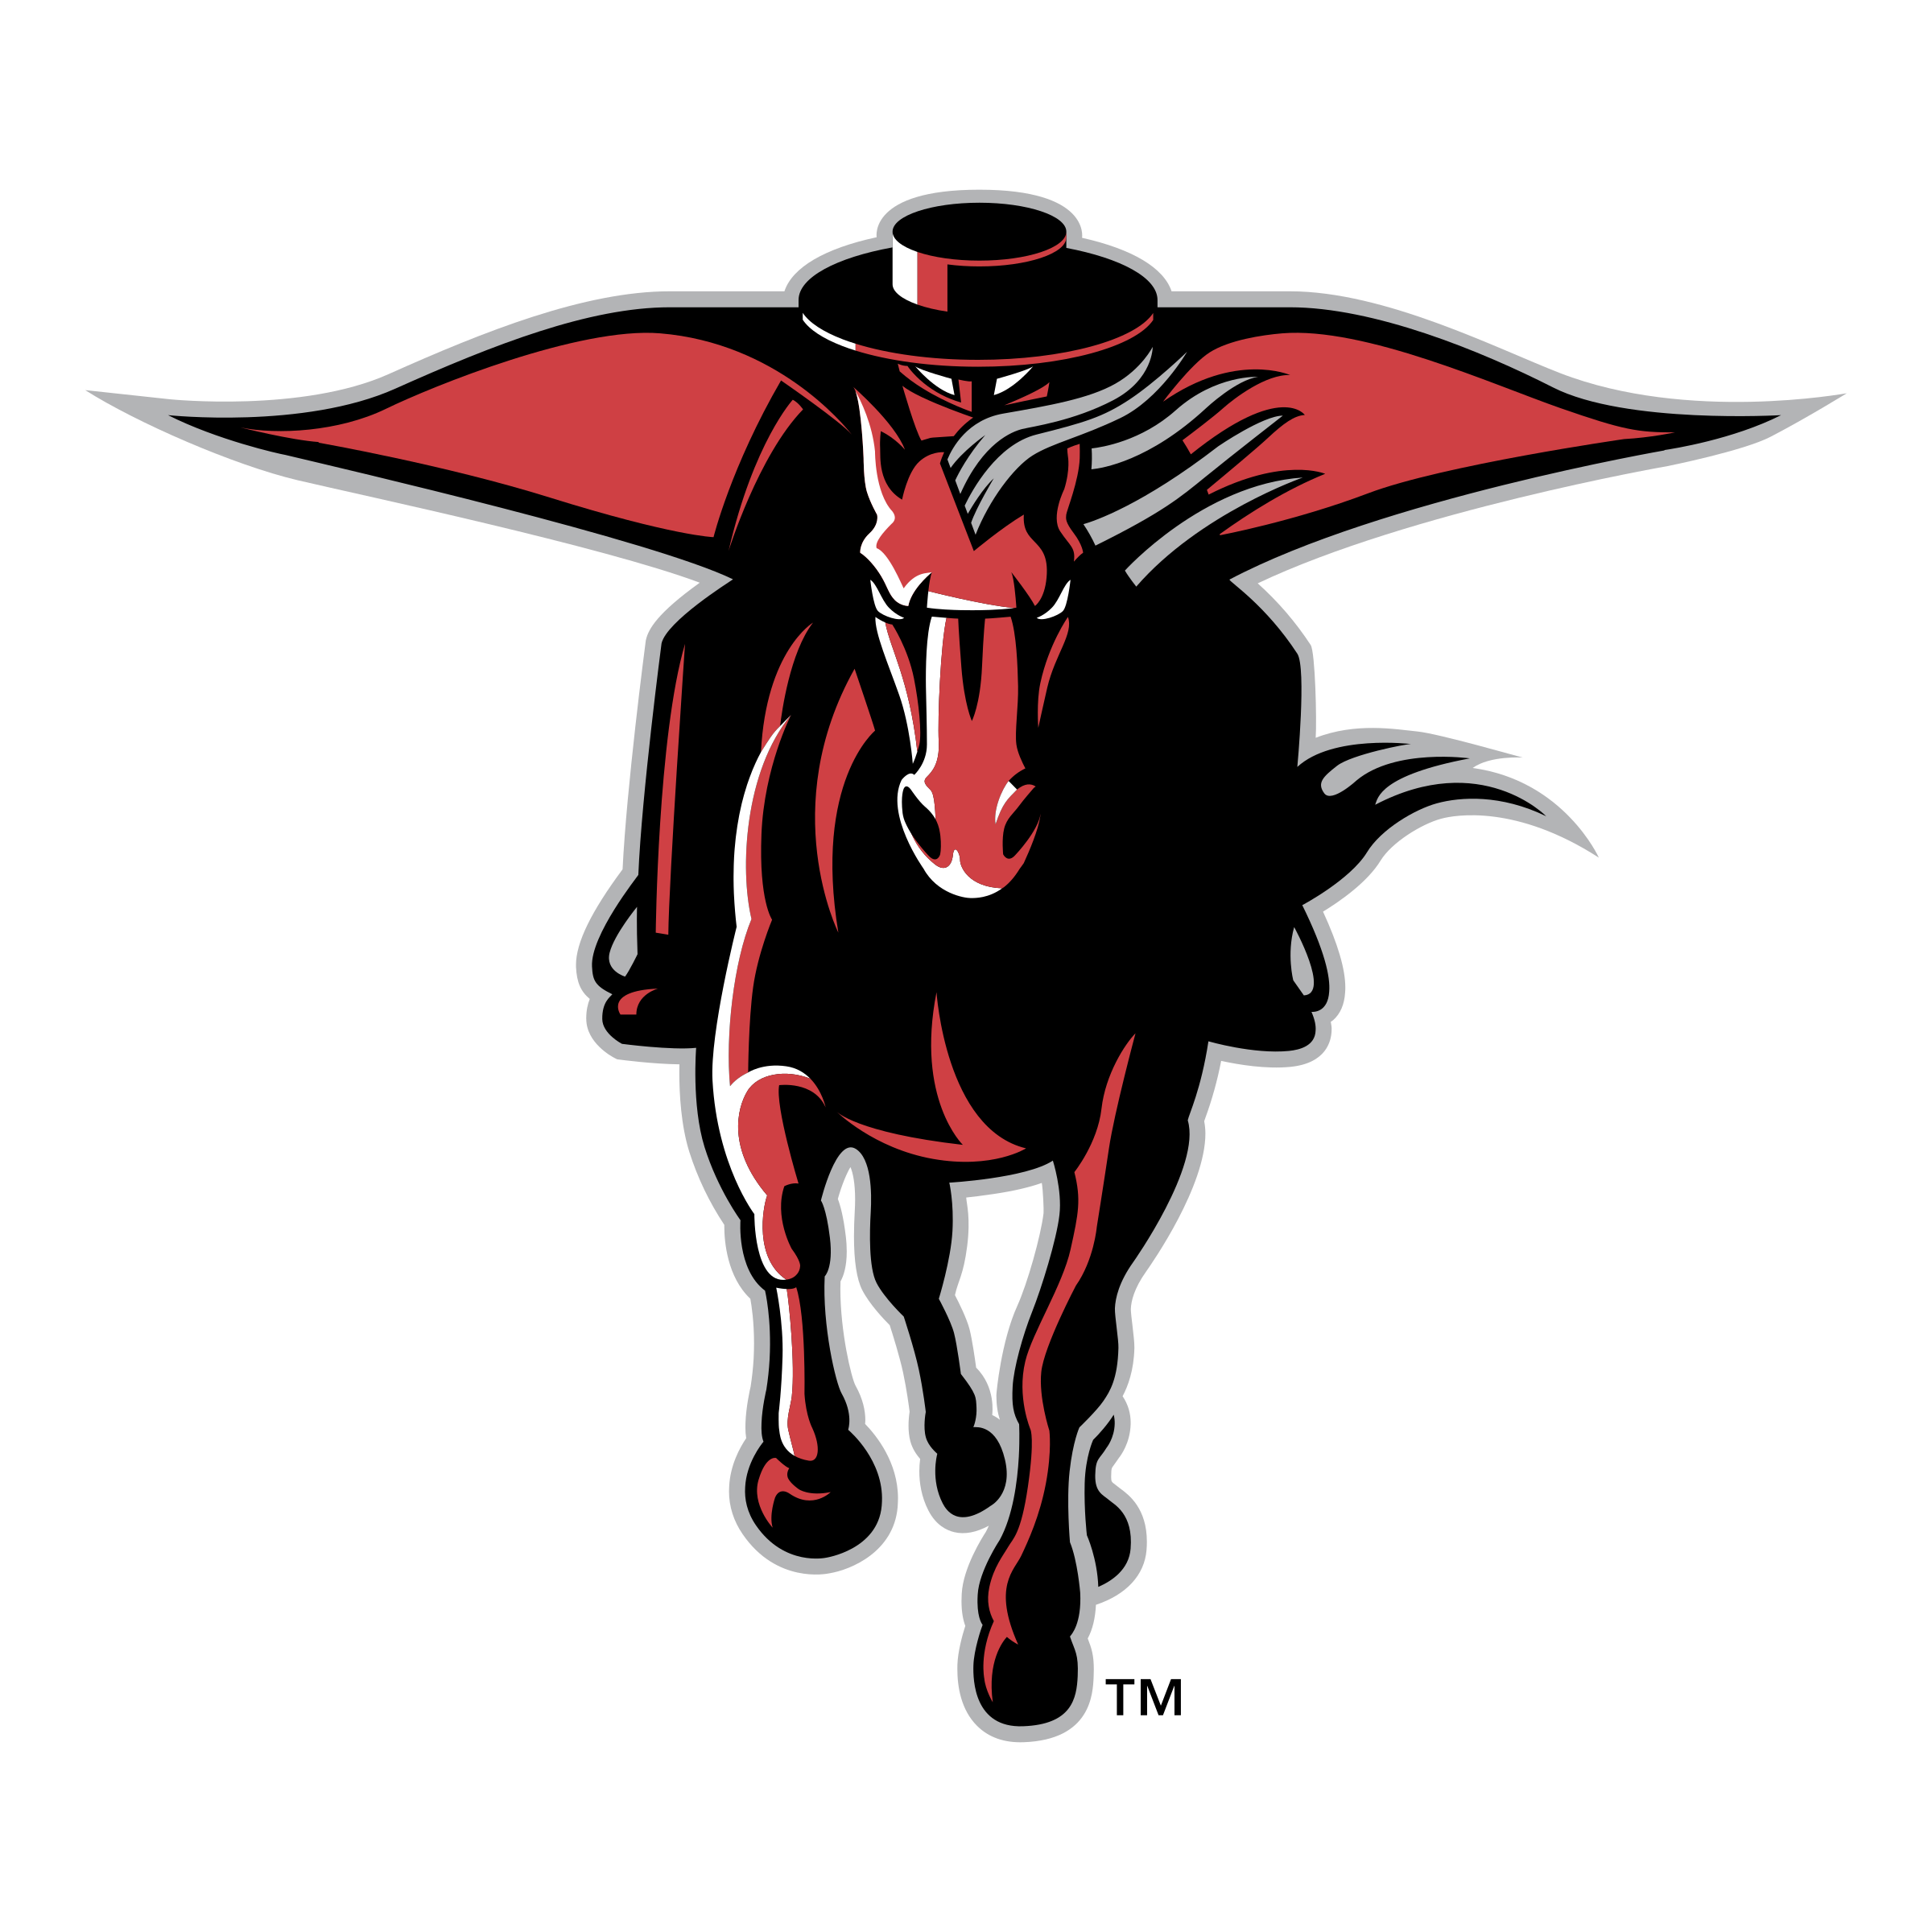 Texas Tech Red Raiders Logo PNG Transparent & SVG Vector - Freebie ...